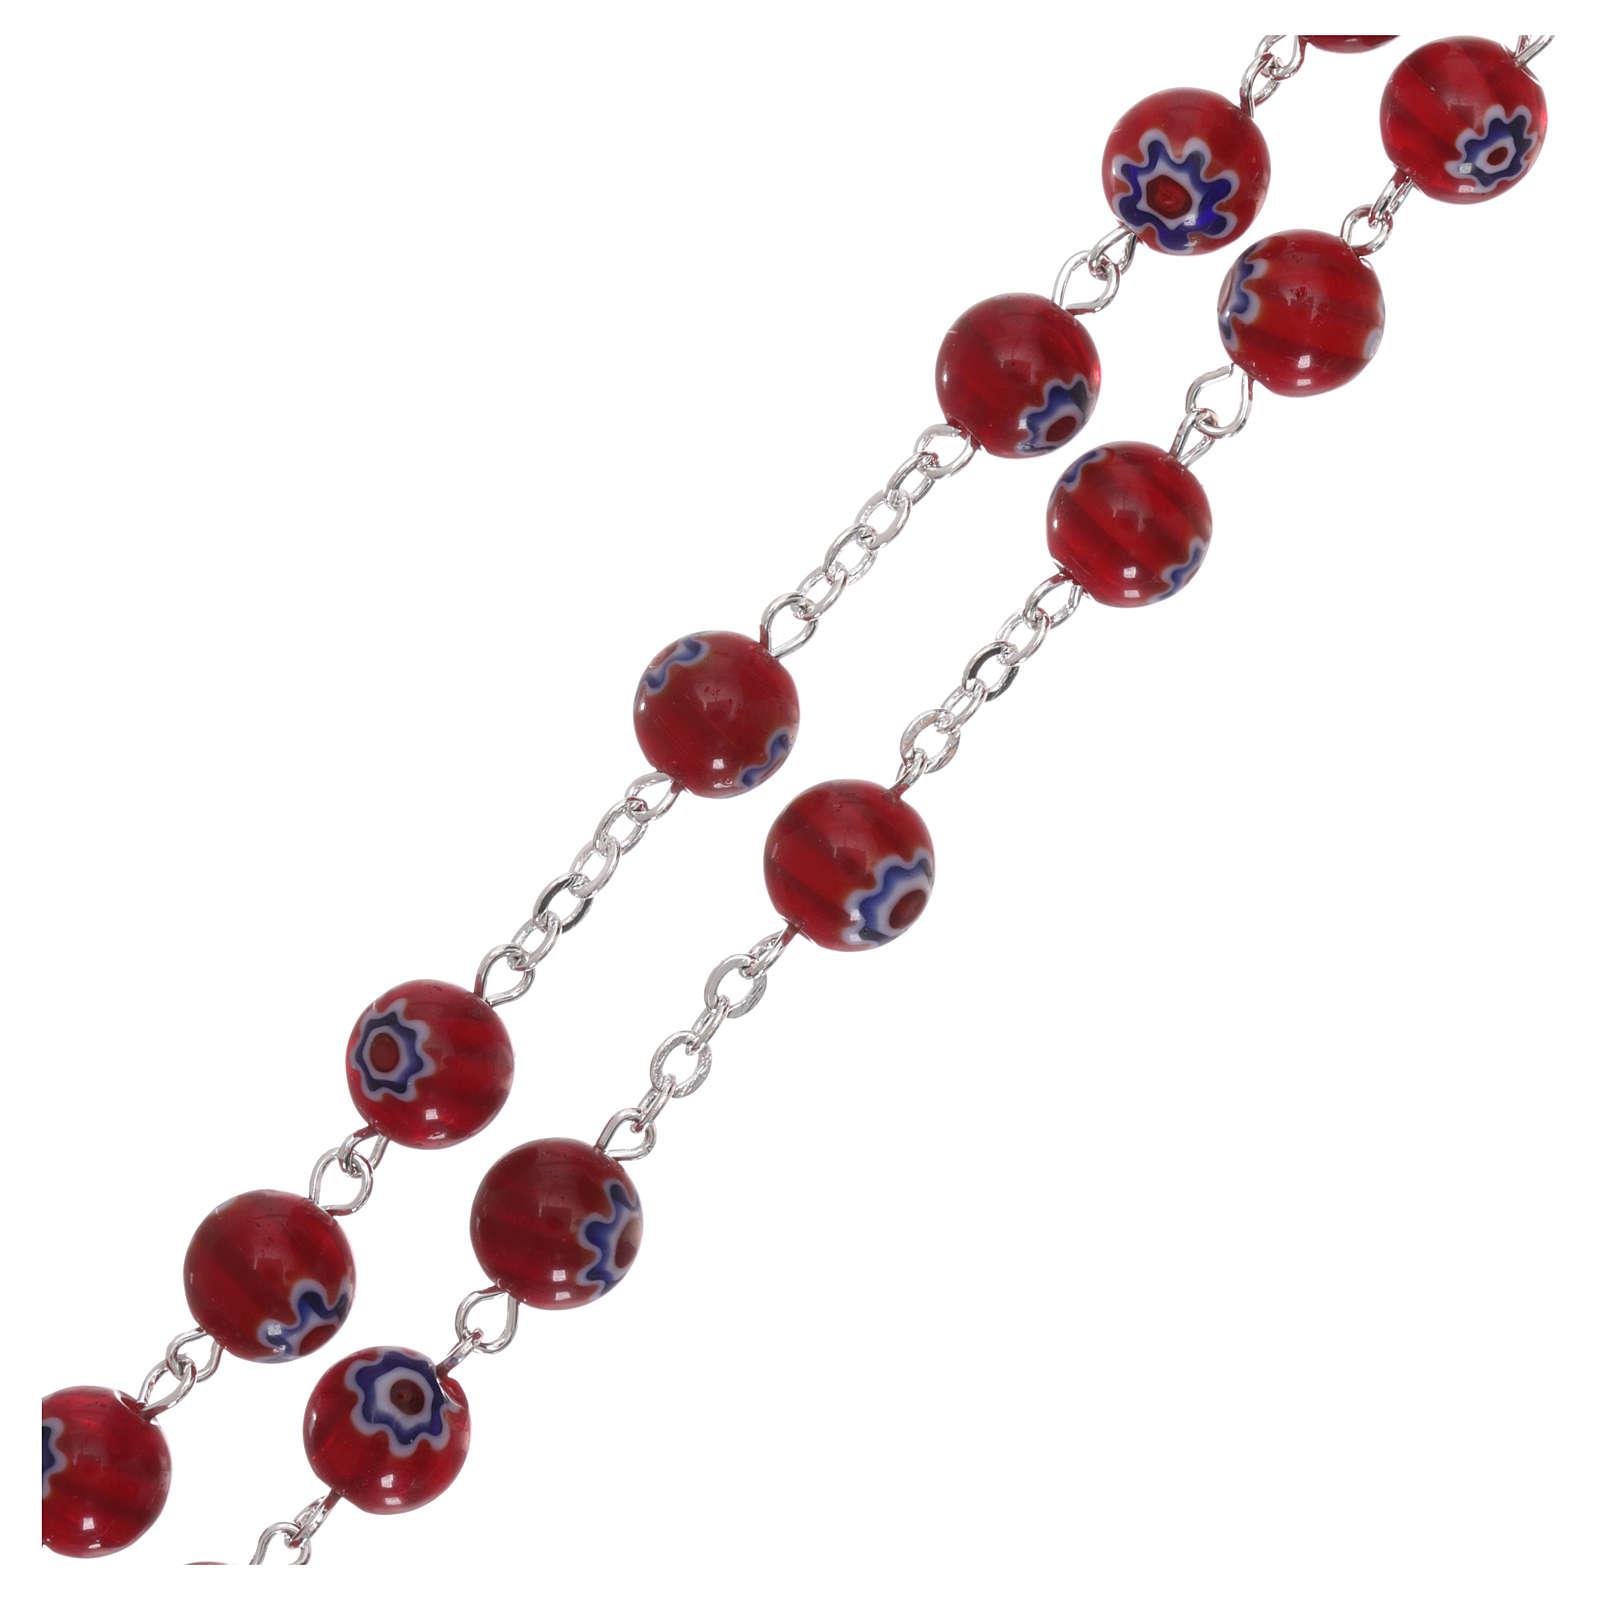 Rosario de vidrio estilo Murrina rojo motivo floreal cuentas 8 mm 4